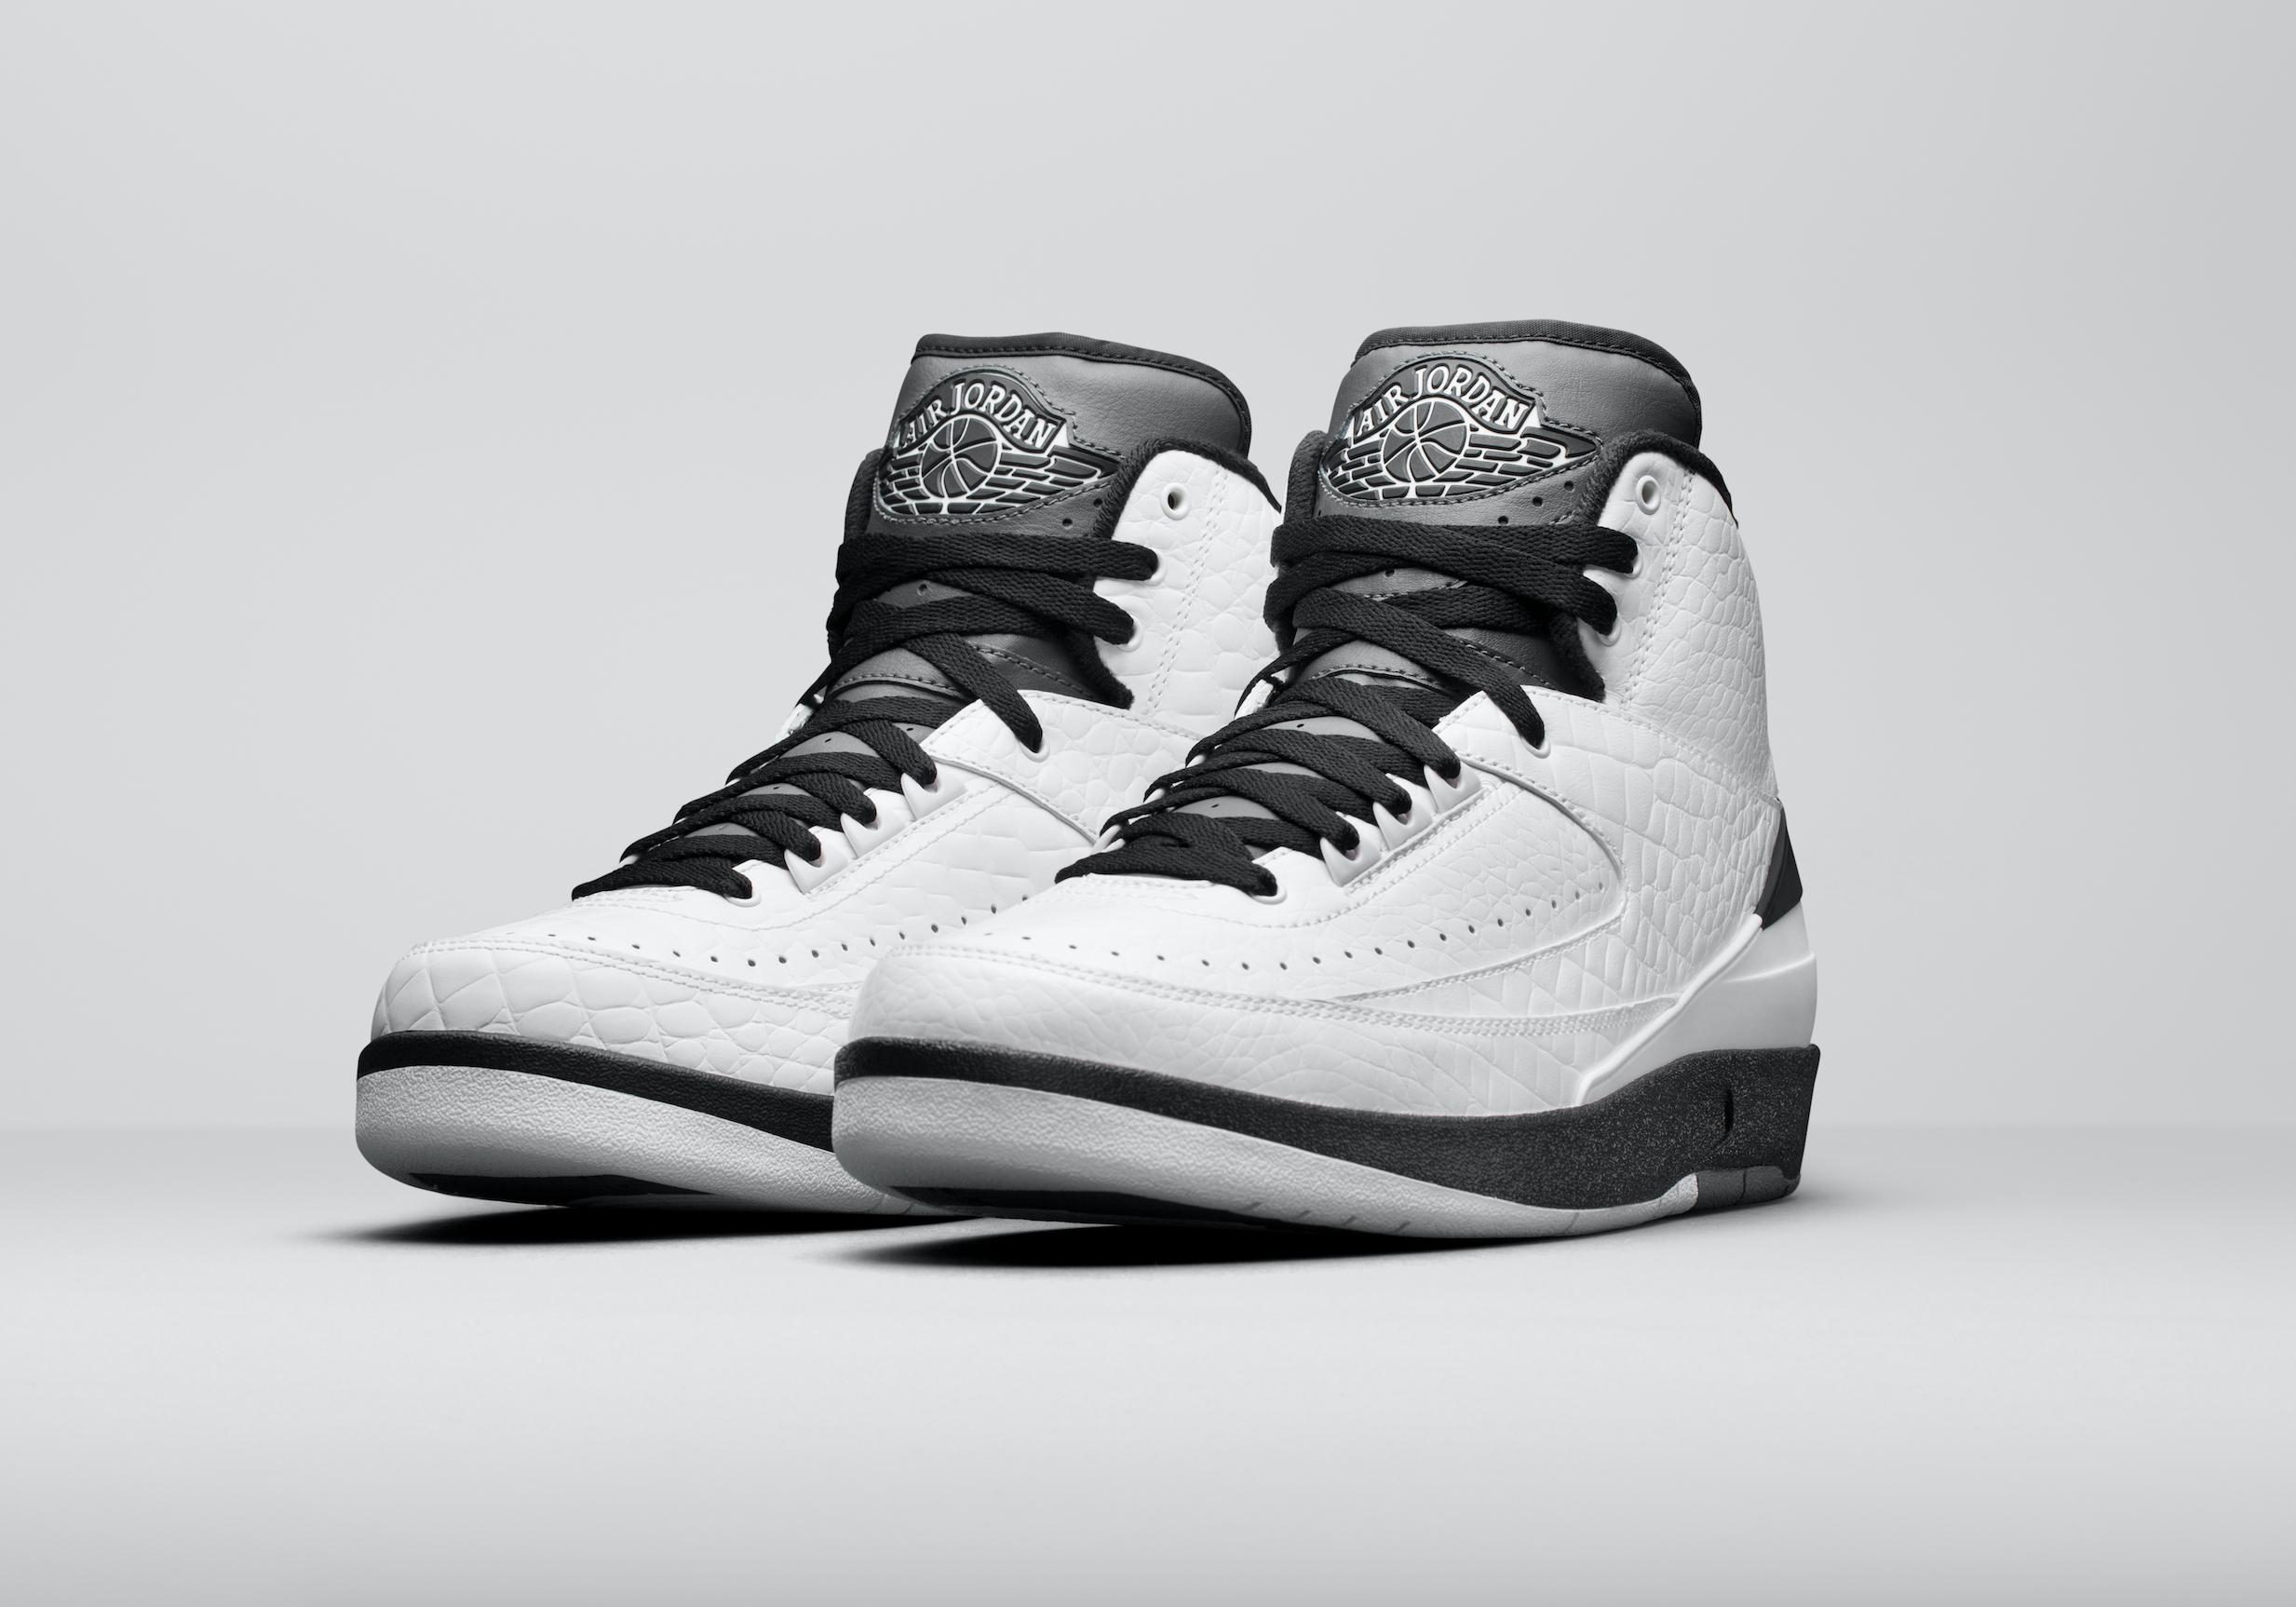 7f55bef7c127 ... air jordan 2 retro concord detailed pics release date all types of  shoes pinterest air jordan